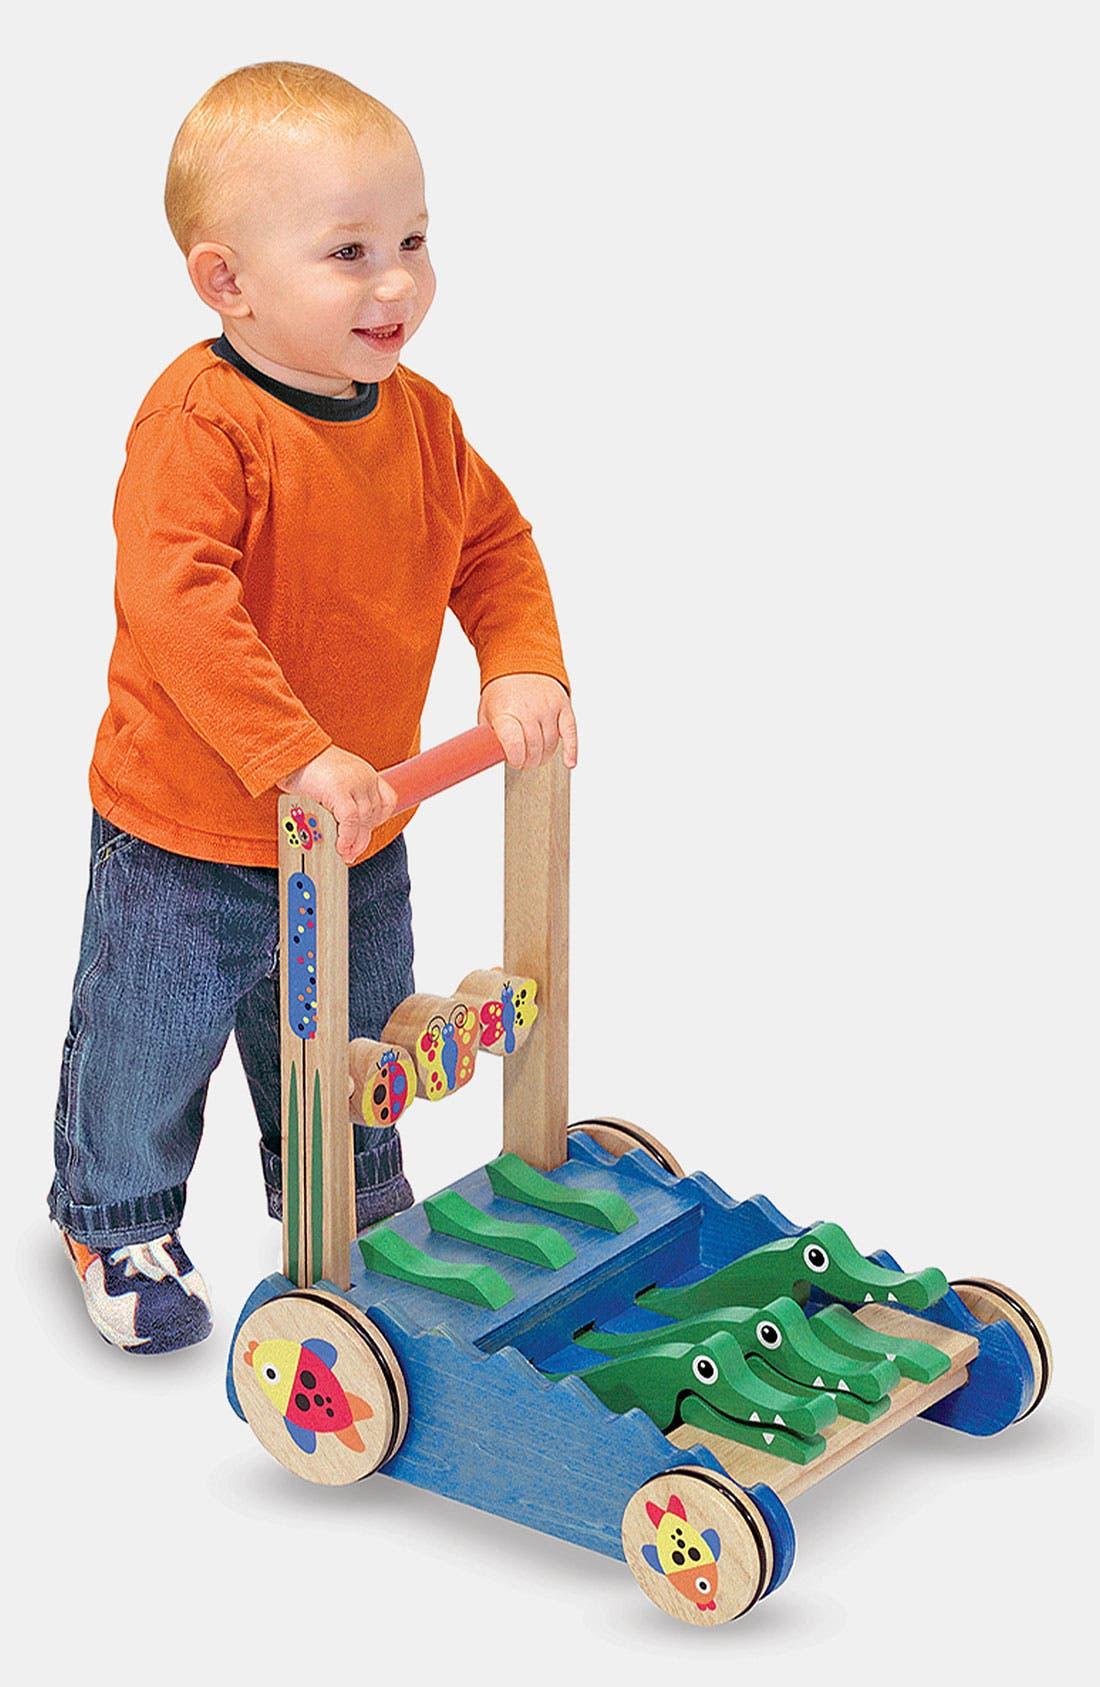 Chomp & Clack Alligator Push Toy,                             Main thumbnail 1, color,                             MUL